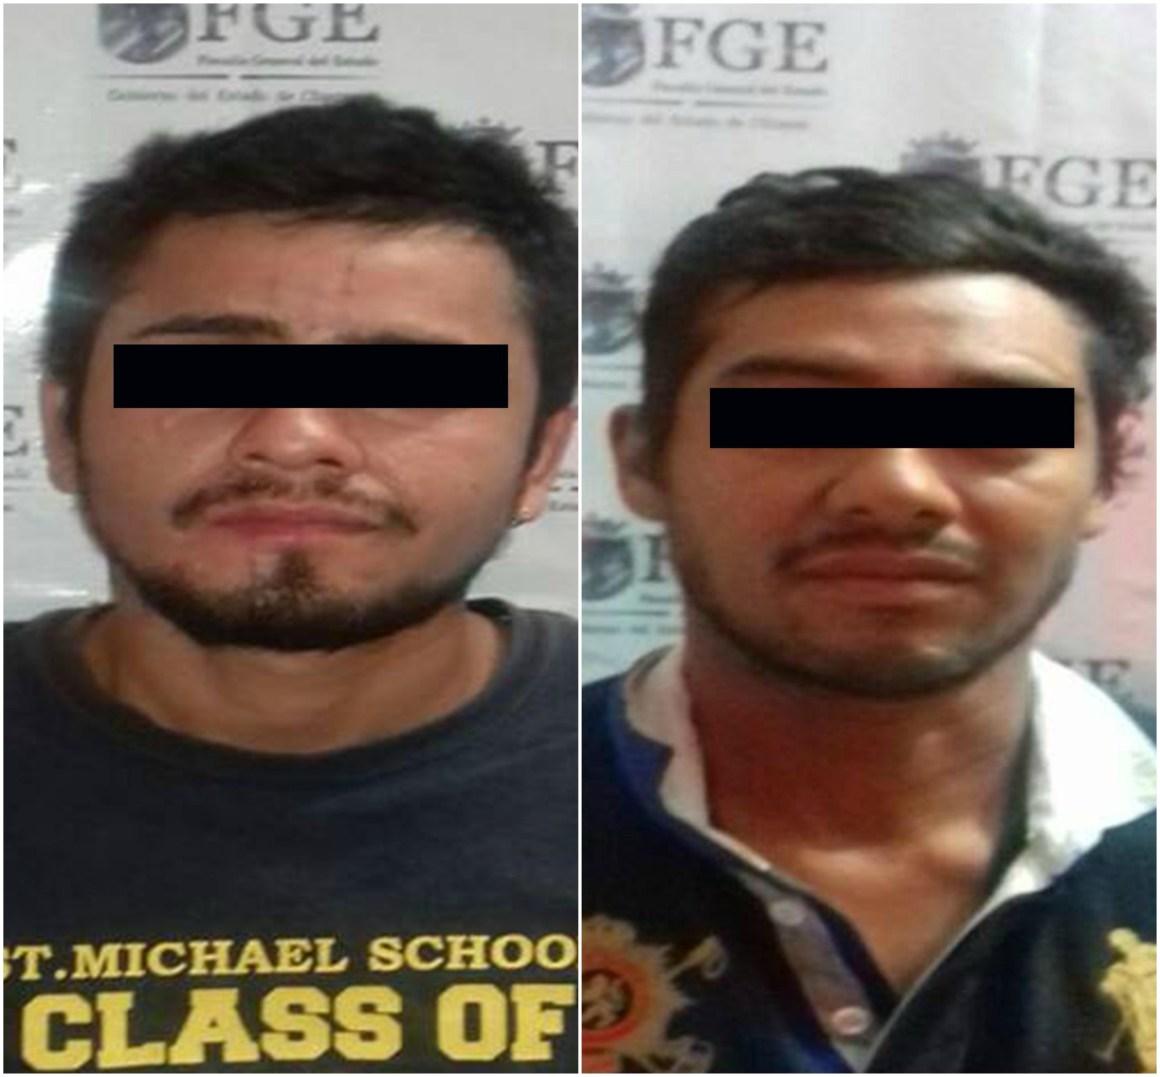 Vinculan a proceso a dos presuntos sujetos por delitos de abigeato